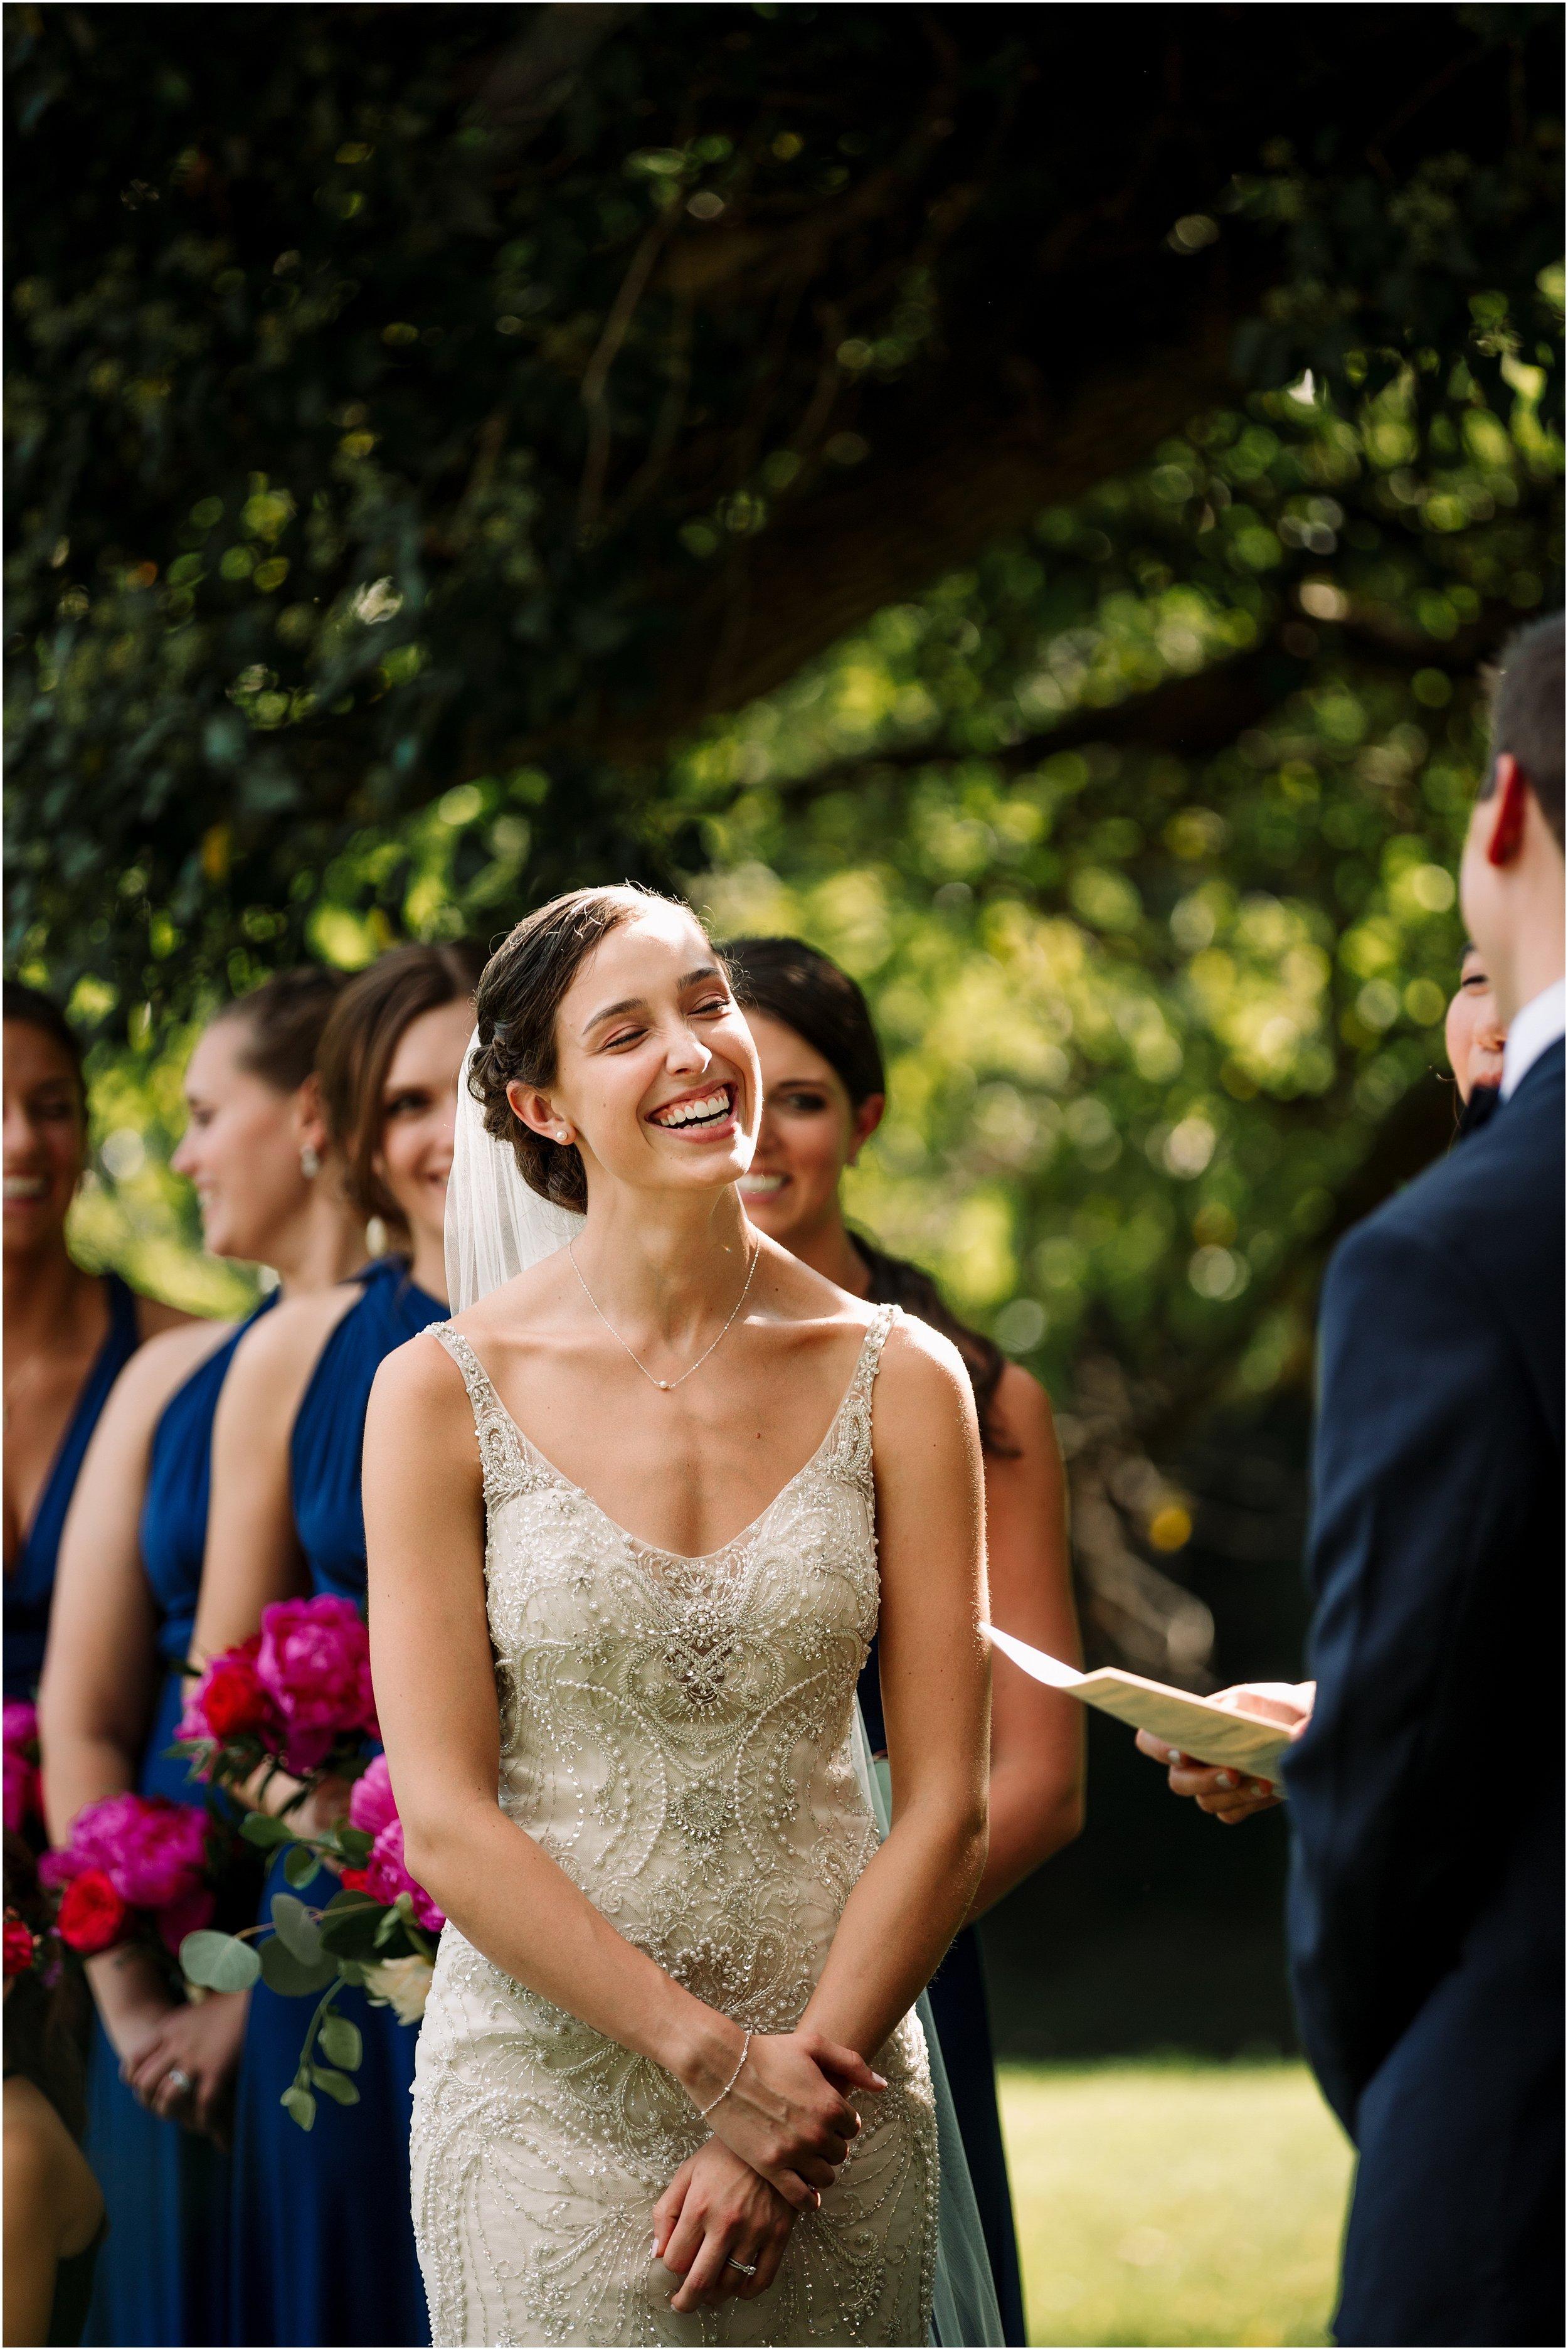 hannah leigh photography Antrim 1844 Wedding_1216.jpg